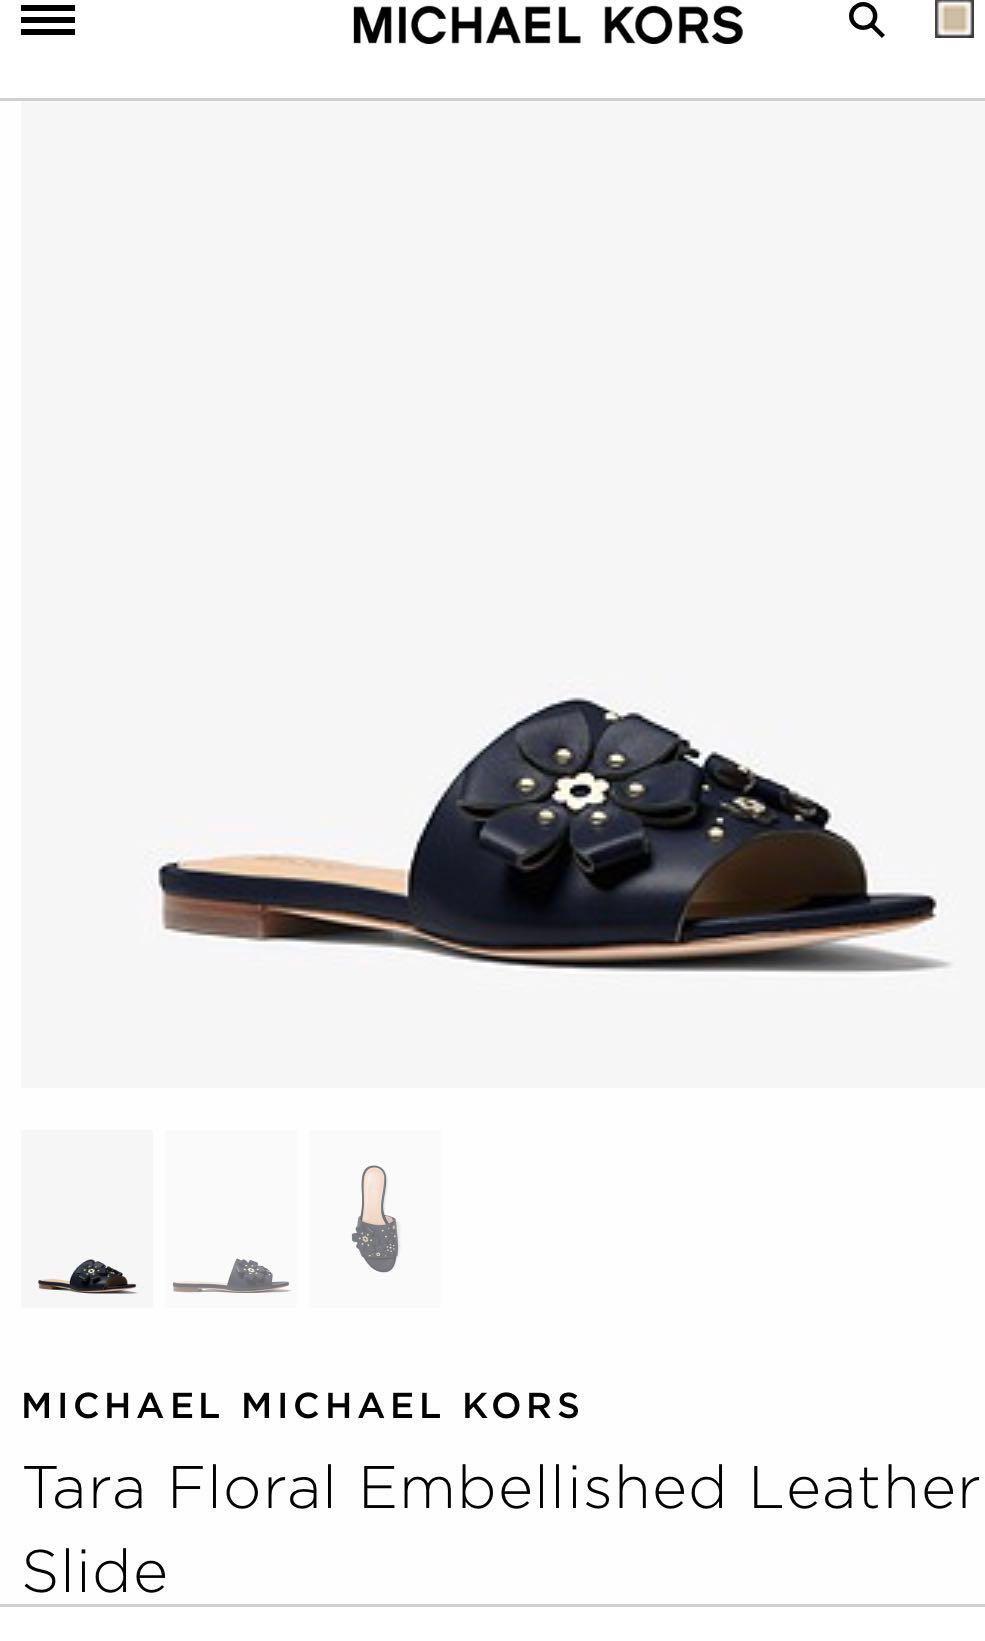 56649fc39a8 Michael Kors Leather Tara Floral slide